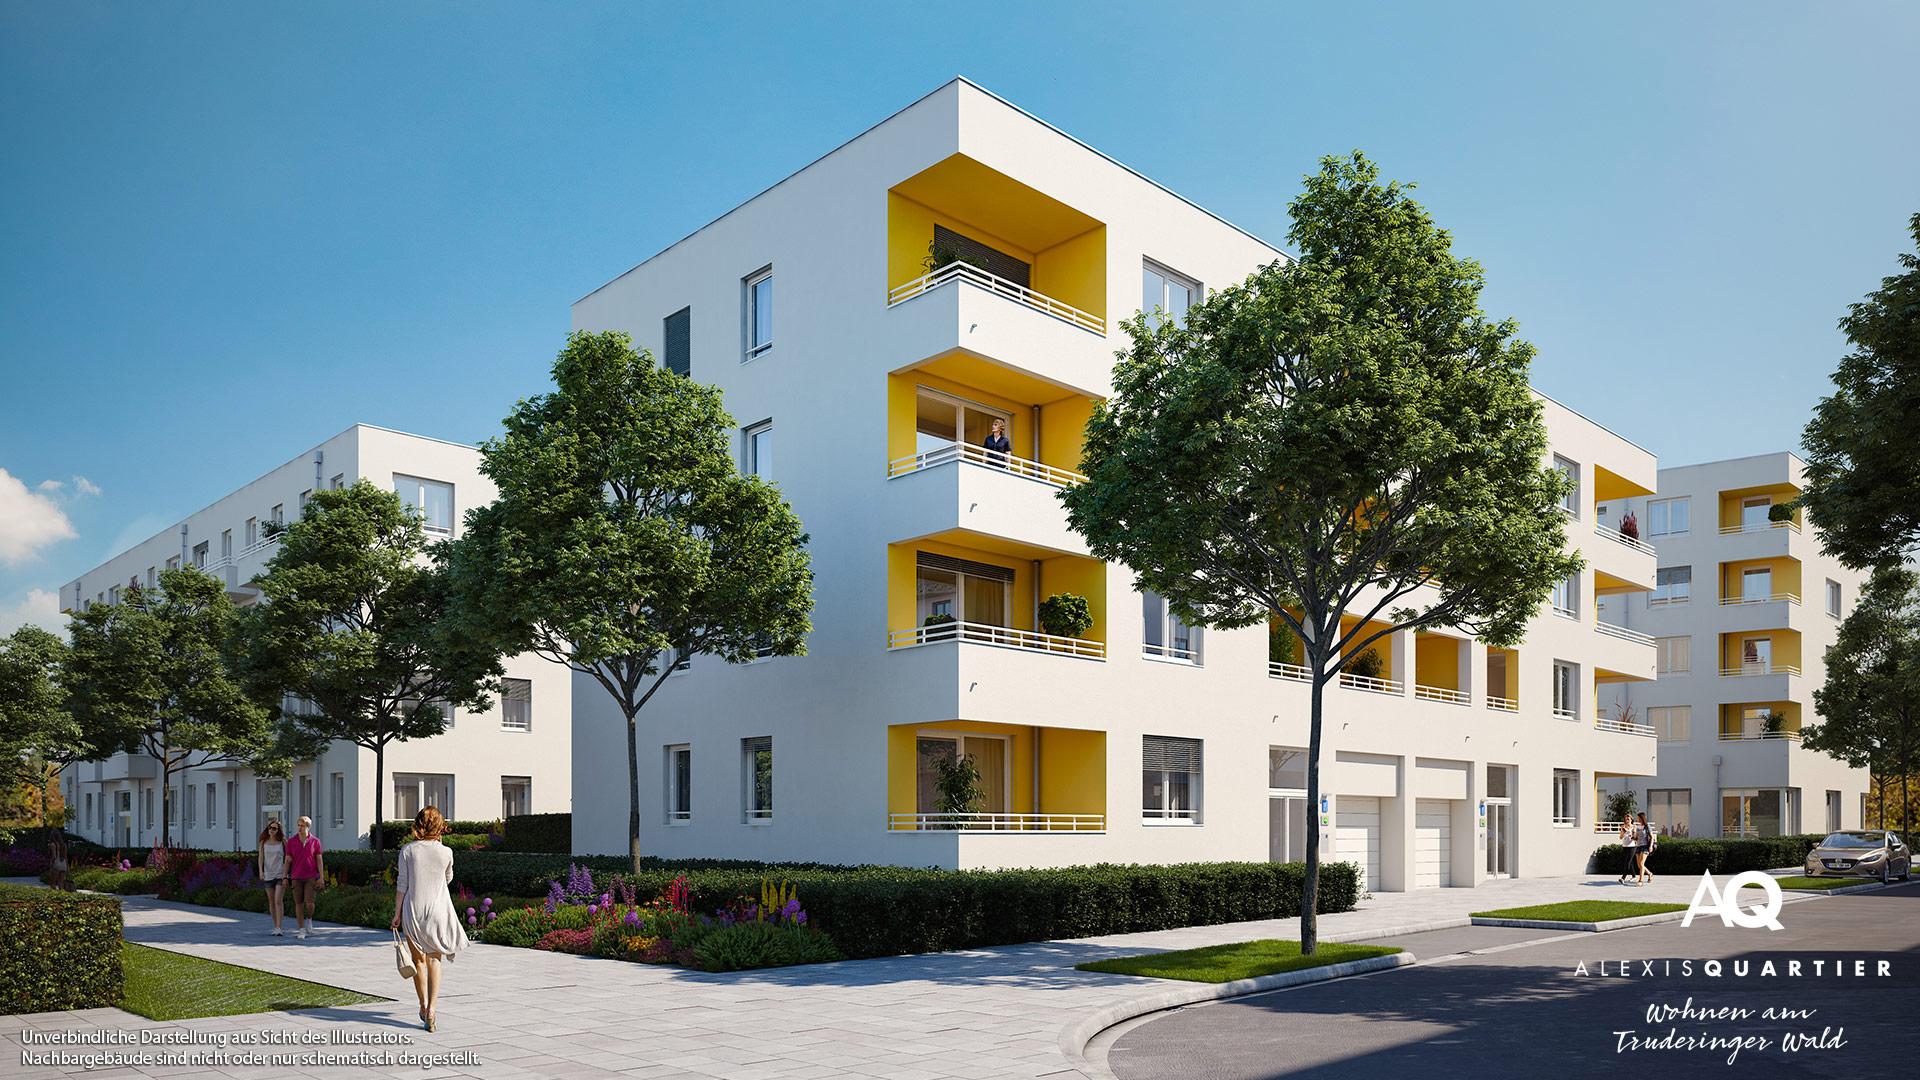 Immobilie Alexisquartier - Wohnen am Truderinger Wald - Illustration 5